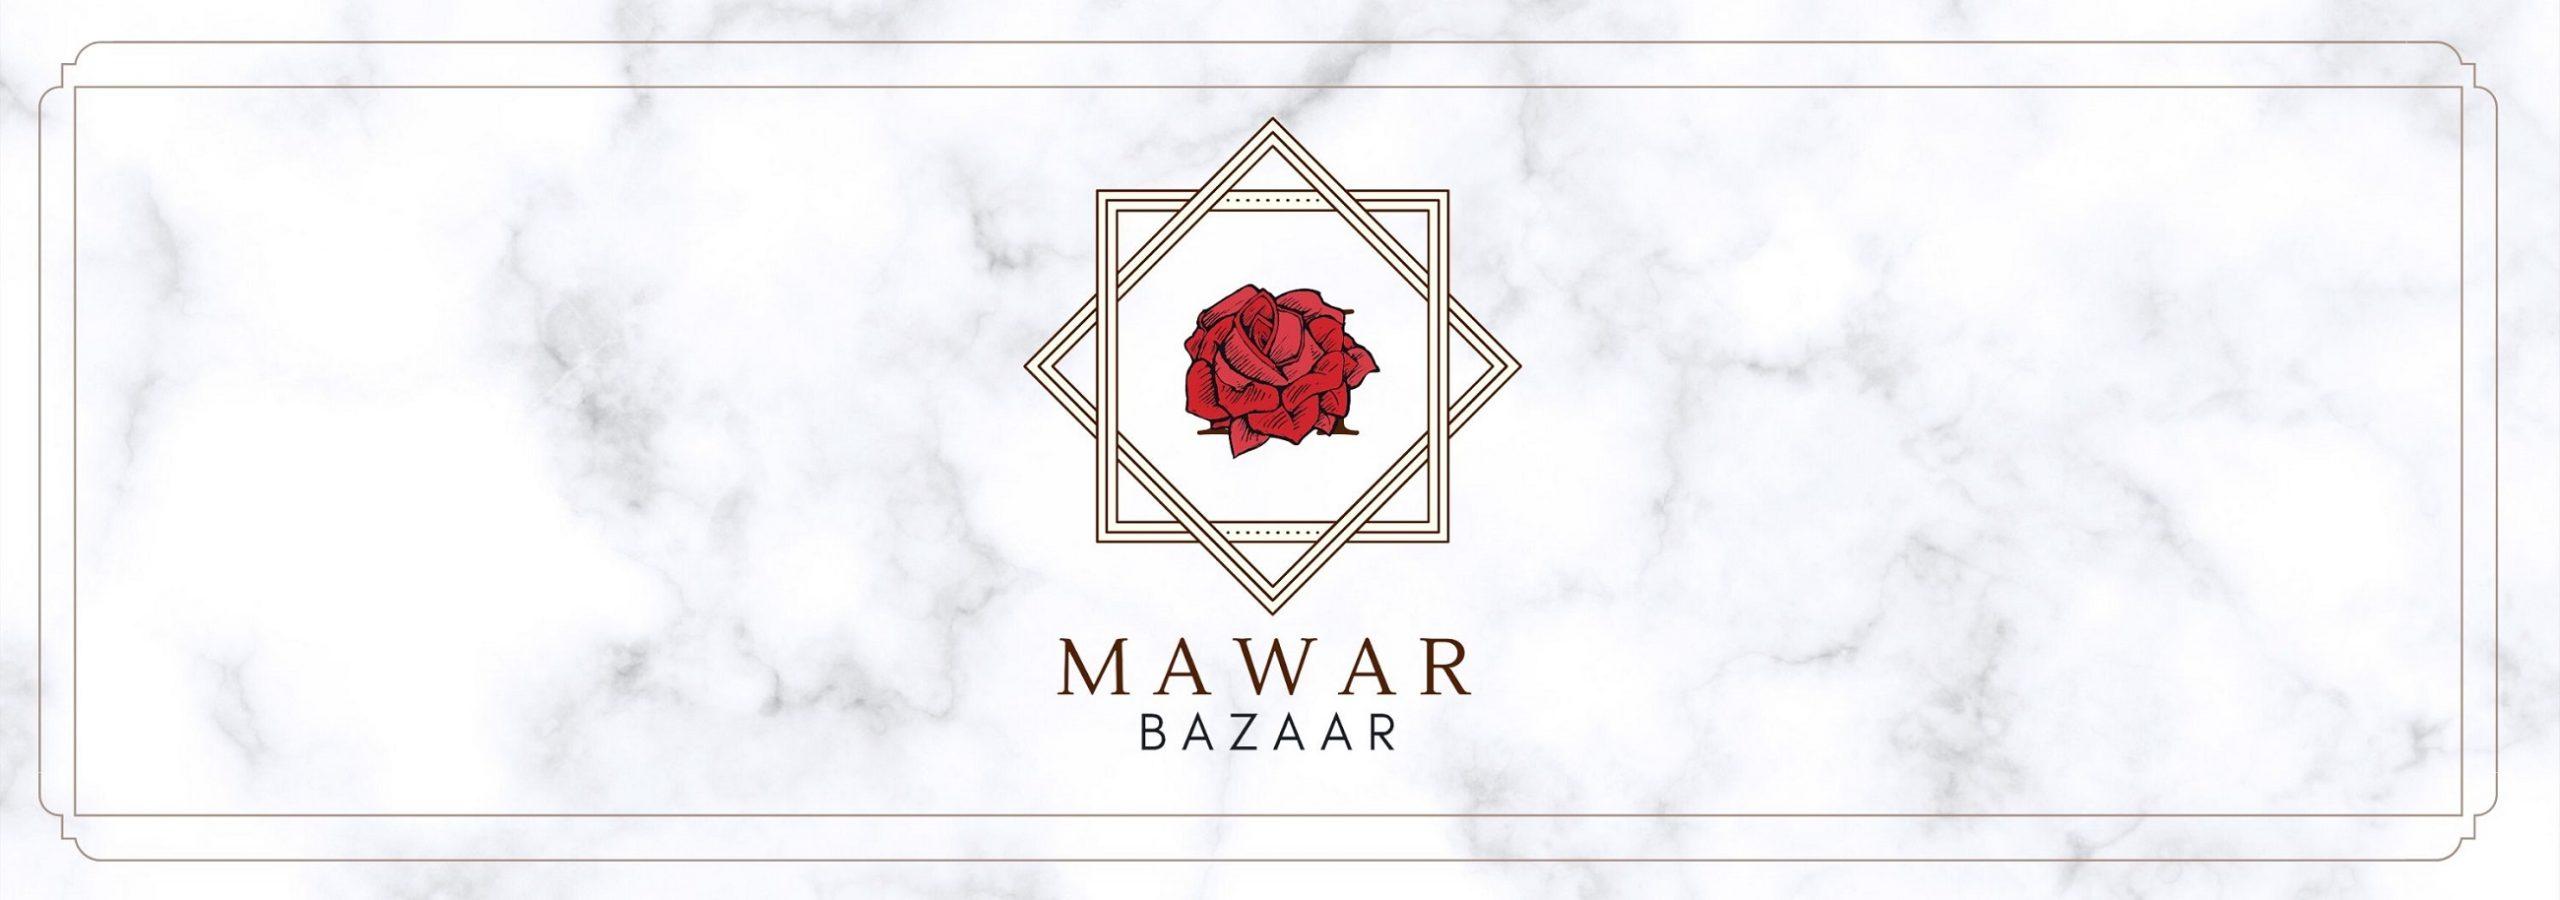 Mawar Bazaar